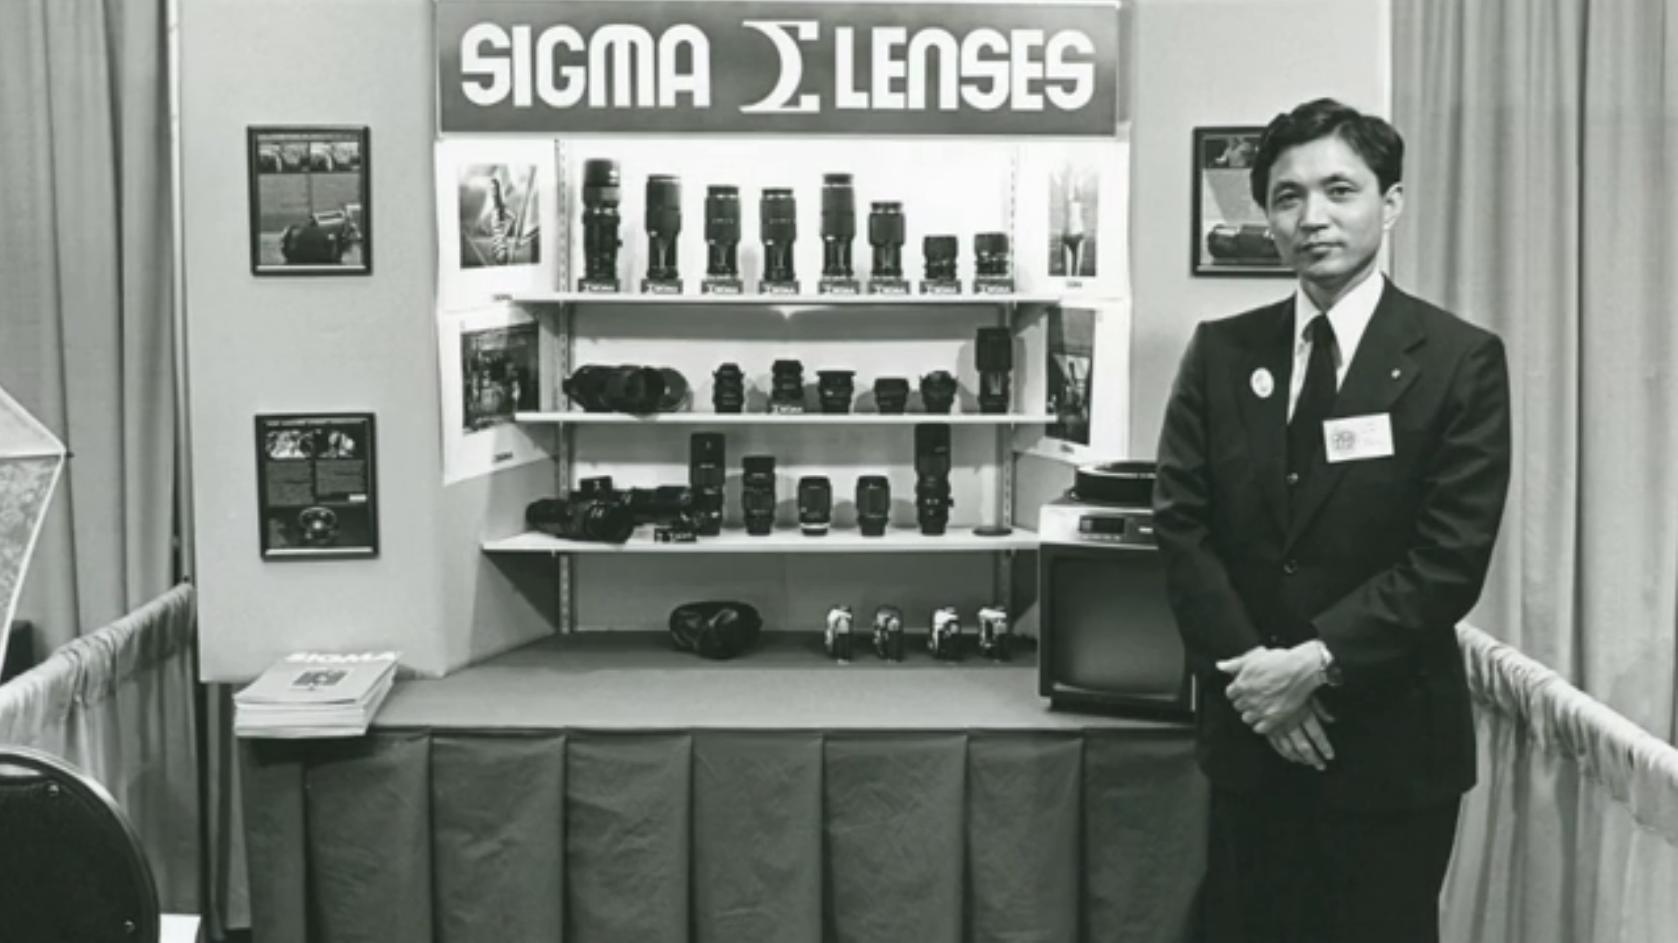 kazuto-yamaki, michihiro-yamaki, sigma-corporation-of-america, sigma-photo, sigma-corporation, manufacturer, camera, lenses, photography, gear, tech